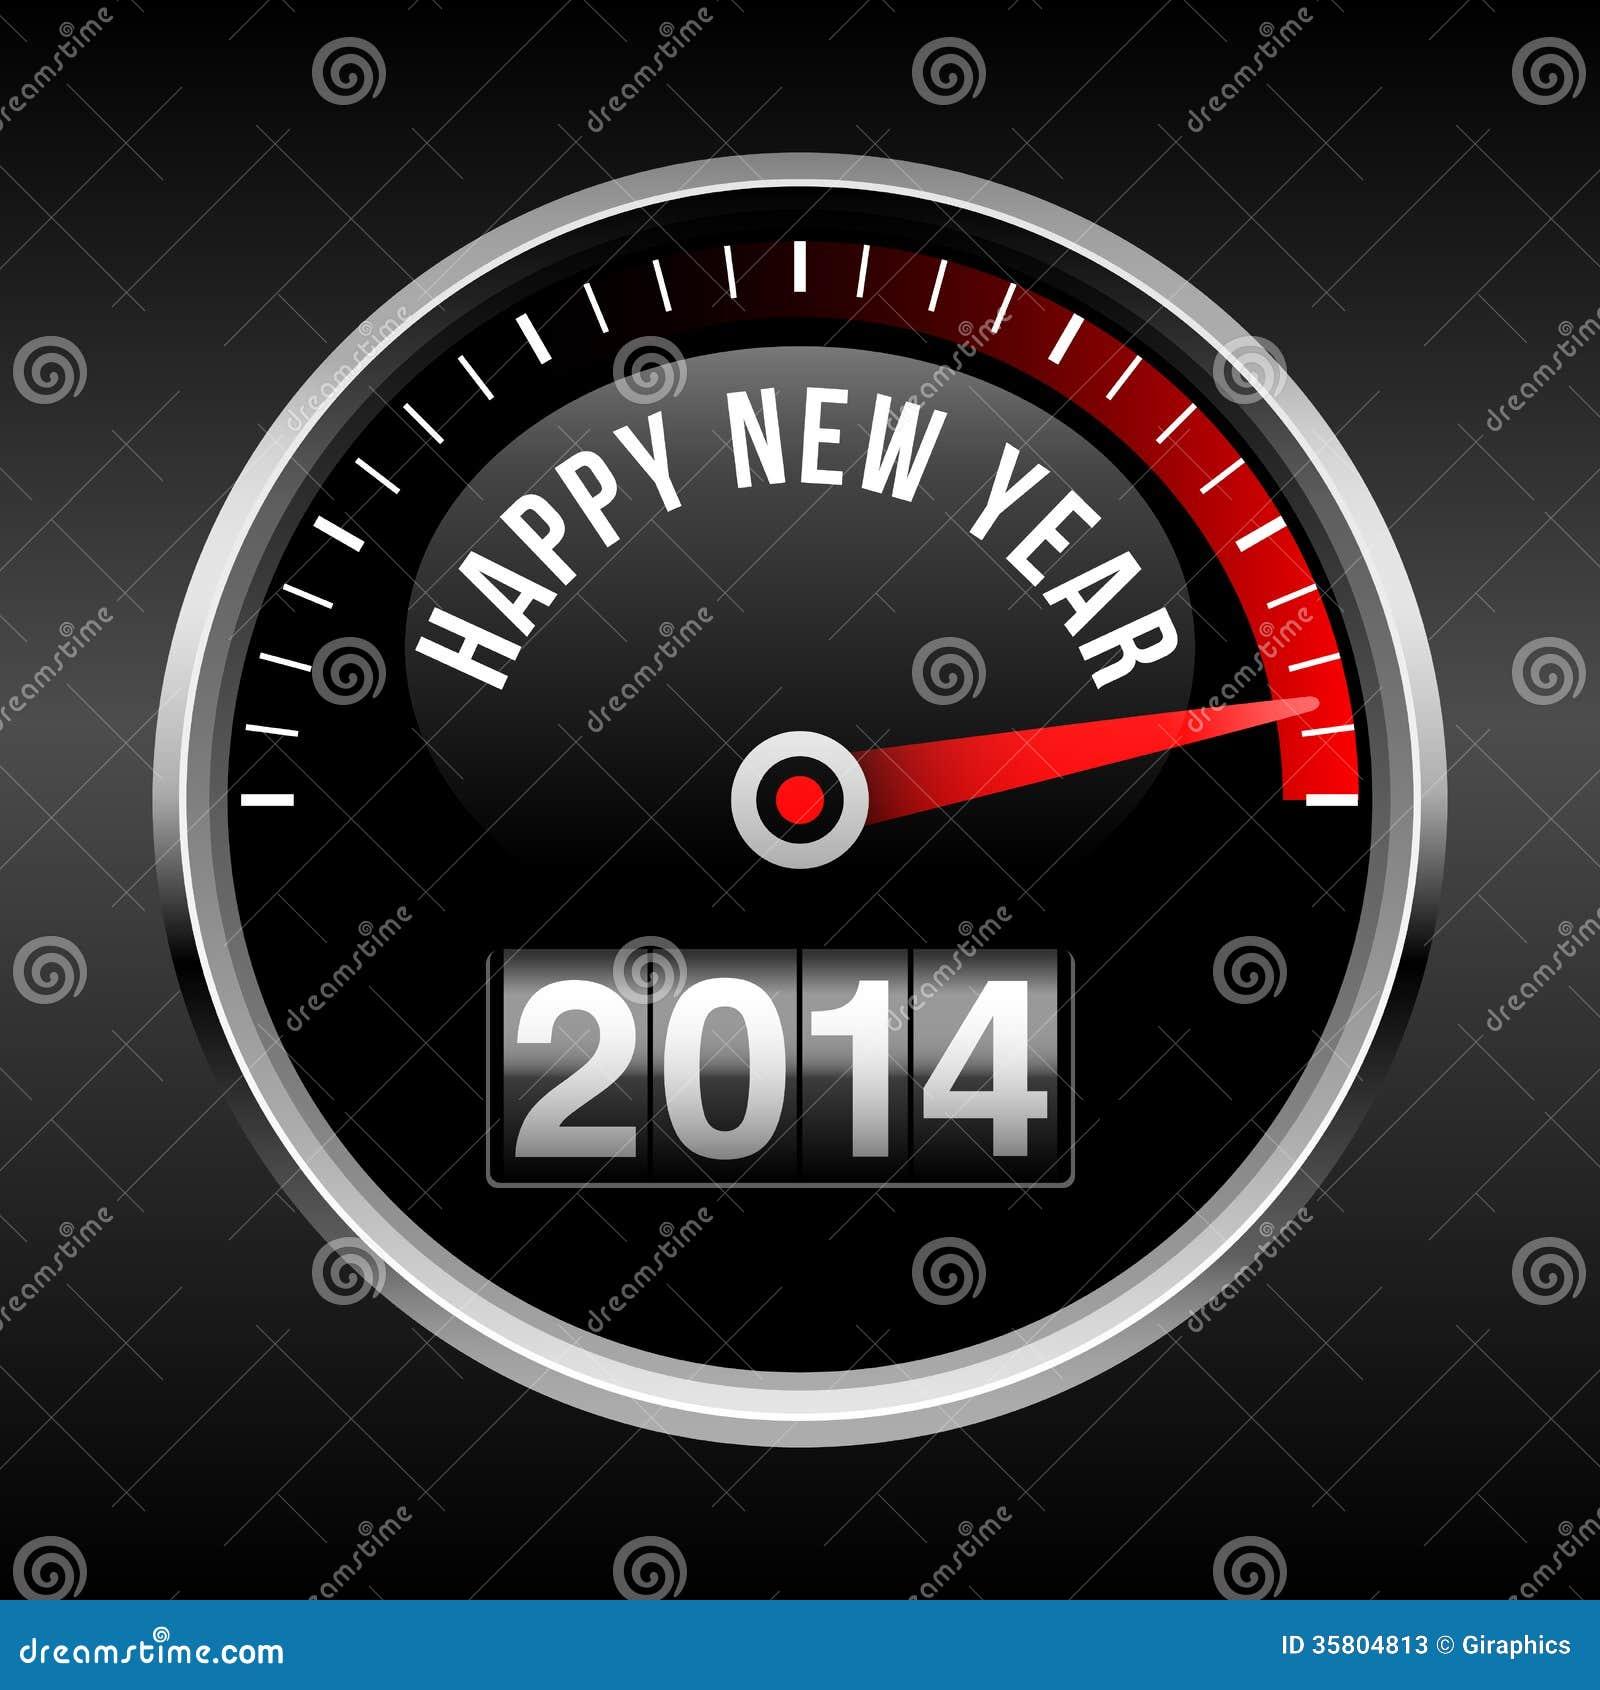 Happy New Year 2014 Dashboard Background